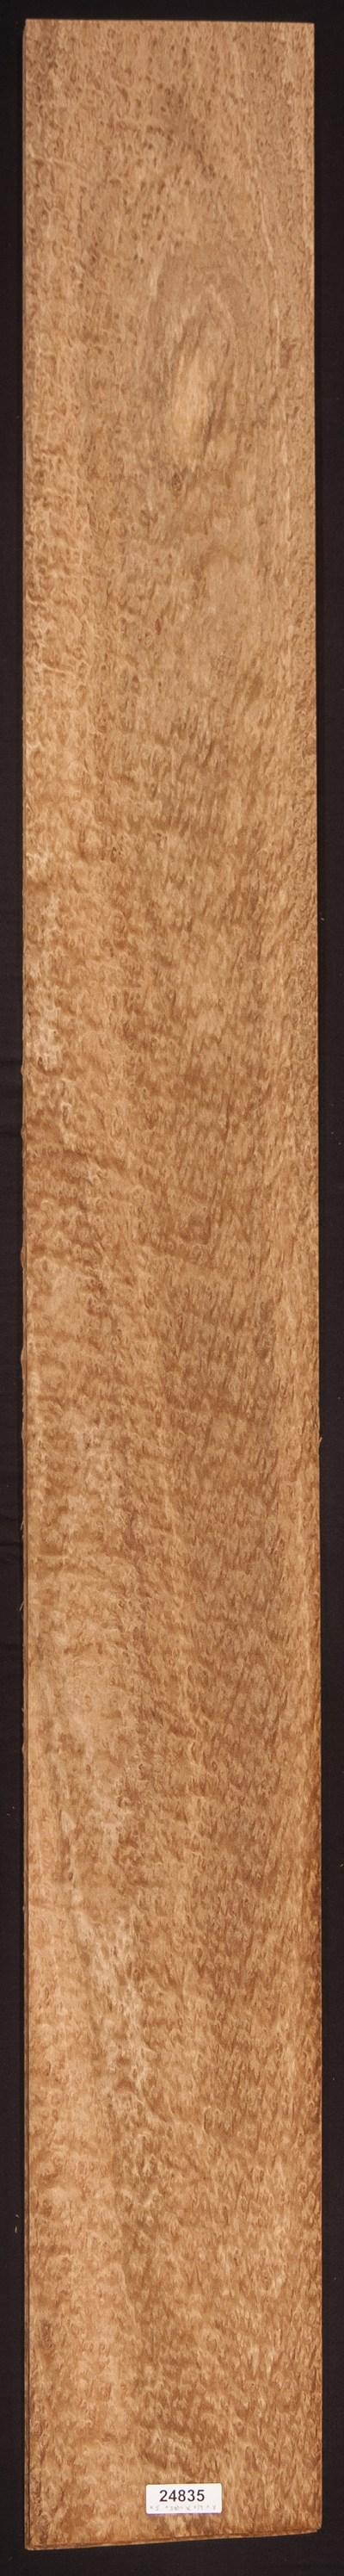 AAA Pommele Eucalyptus Veneer Sheet